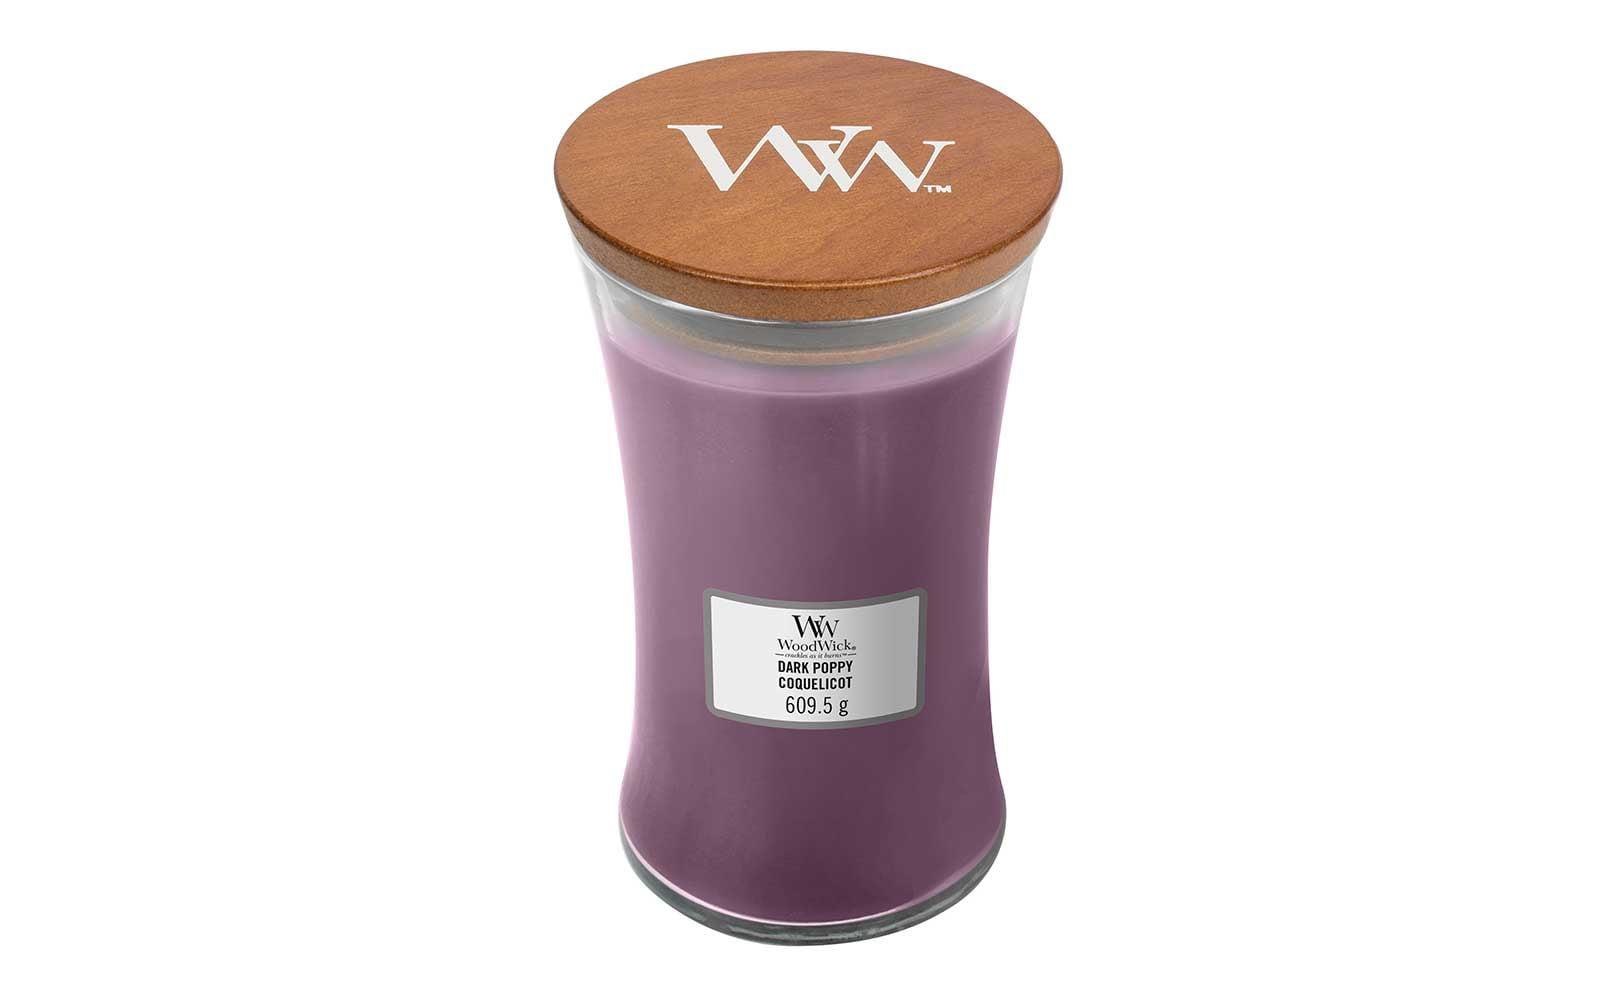 Woodwick Large Dark Poppy Candle